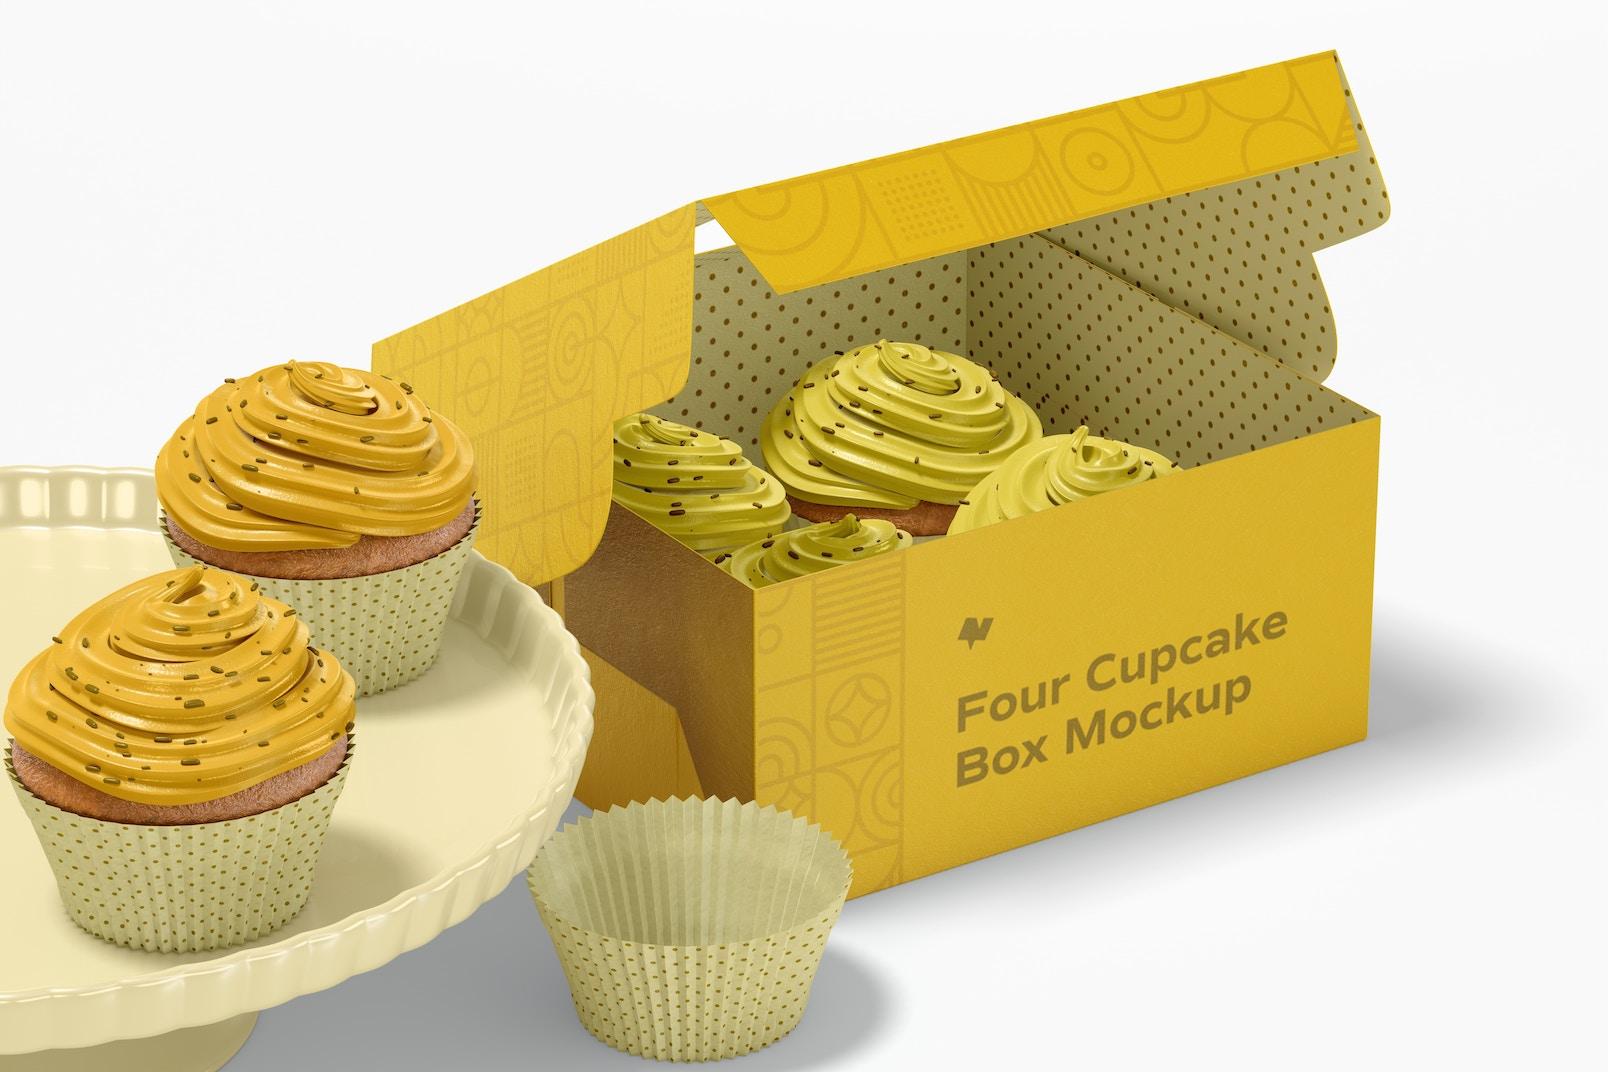 Four Cupcakes Box Mockup